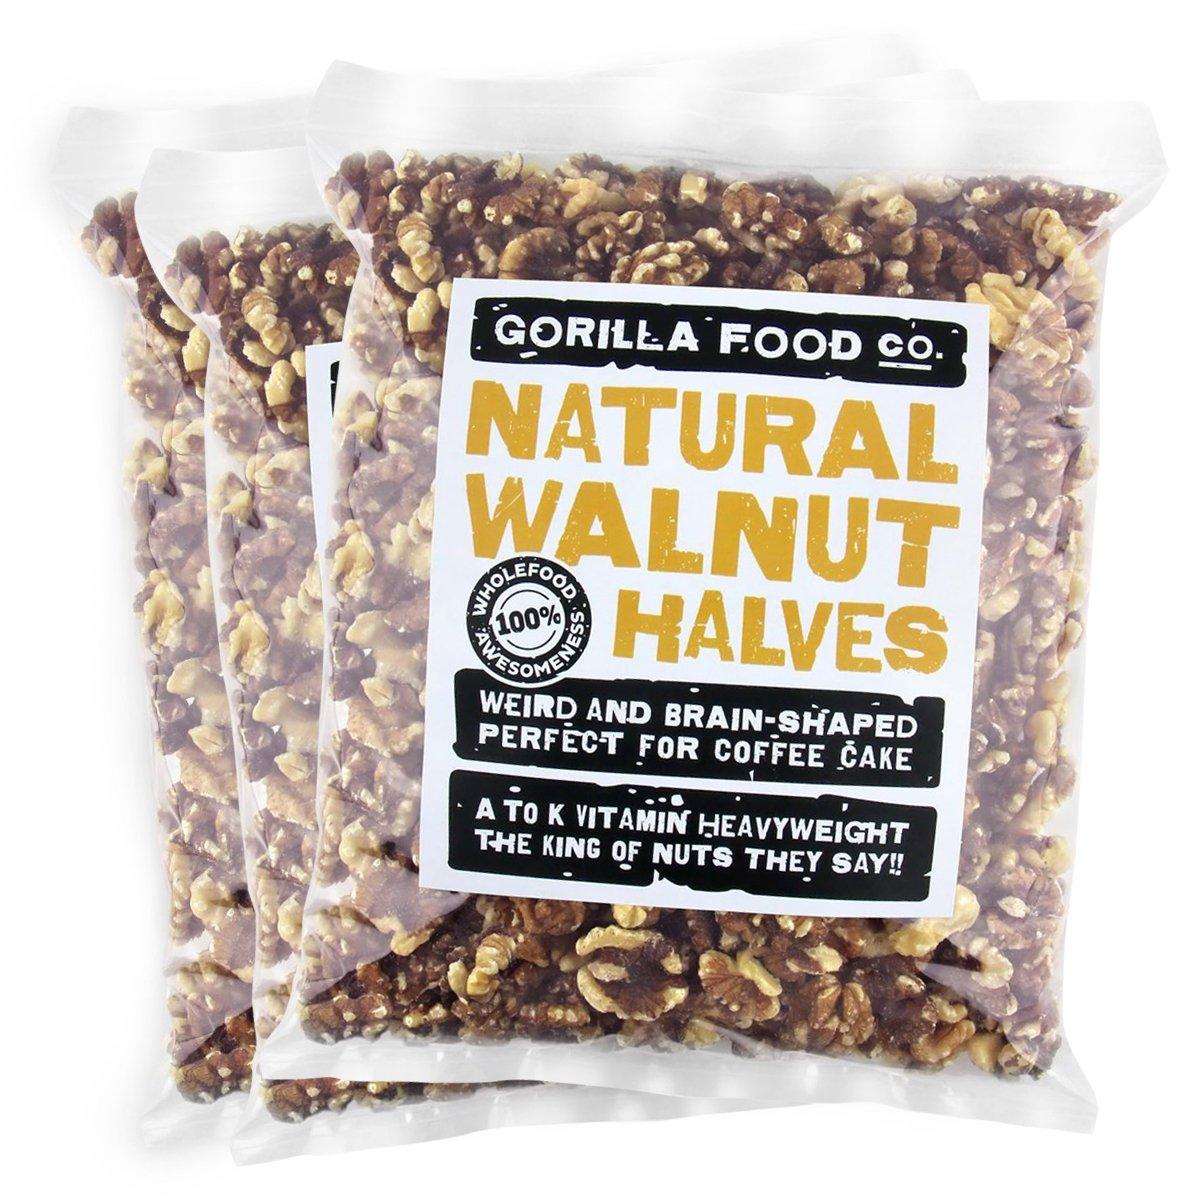 Gorilla Food Co. Light Walnut - Only Shelled Raw Halves Ranking TOP5 High order